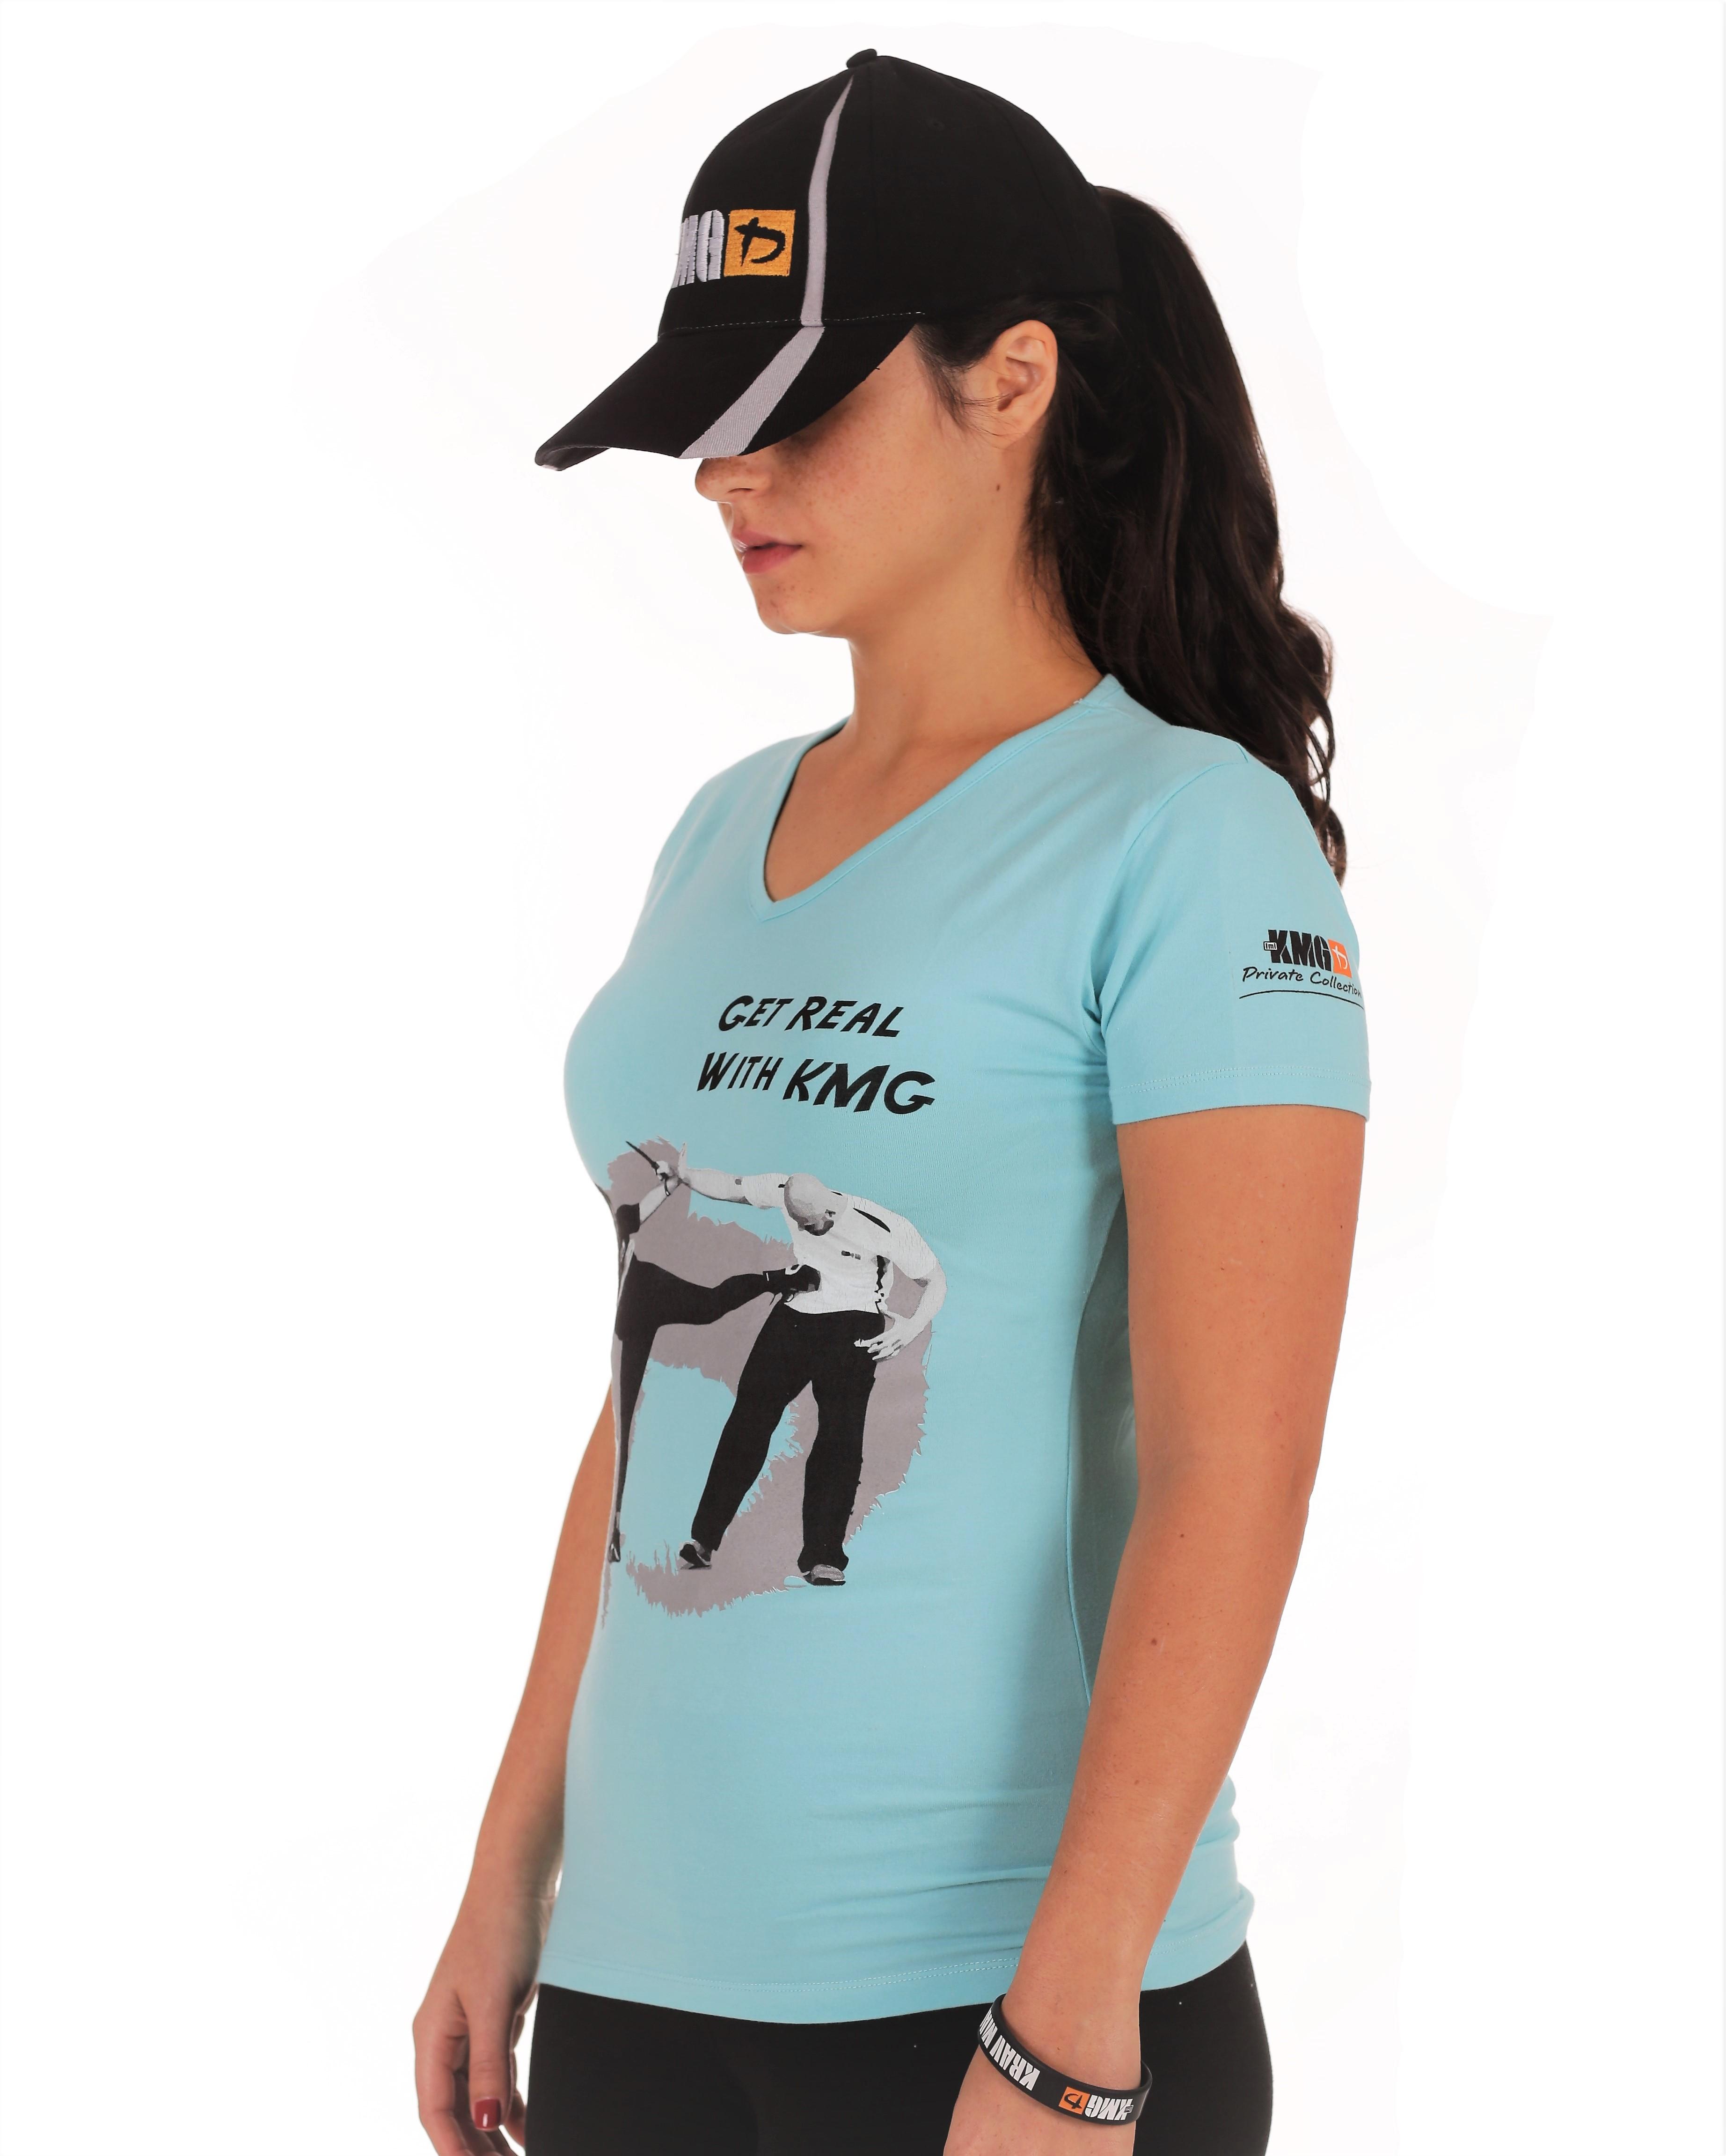 Technique shirt for women - Side